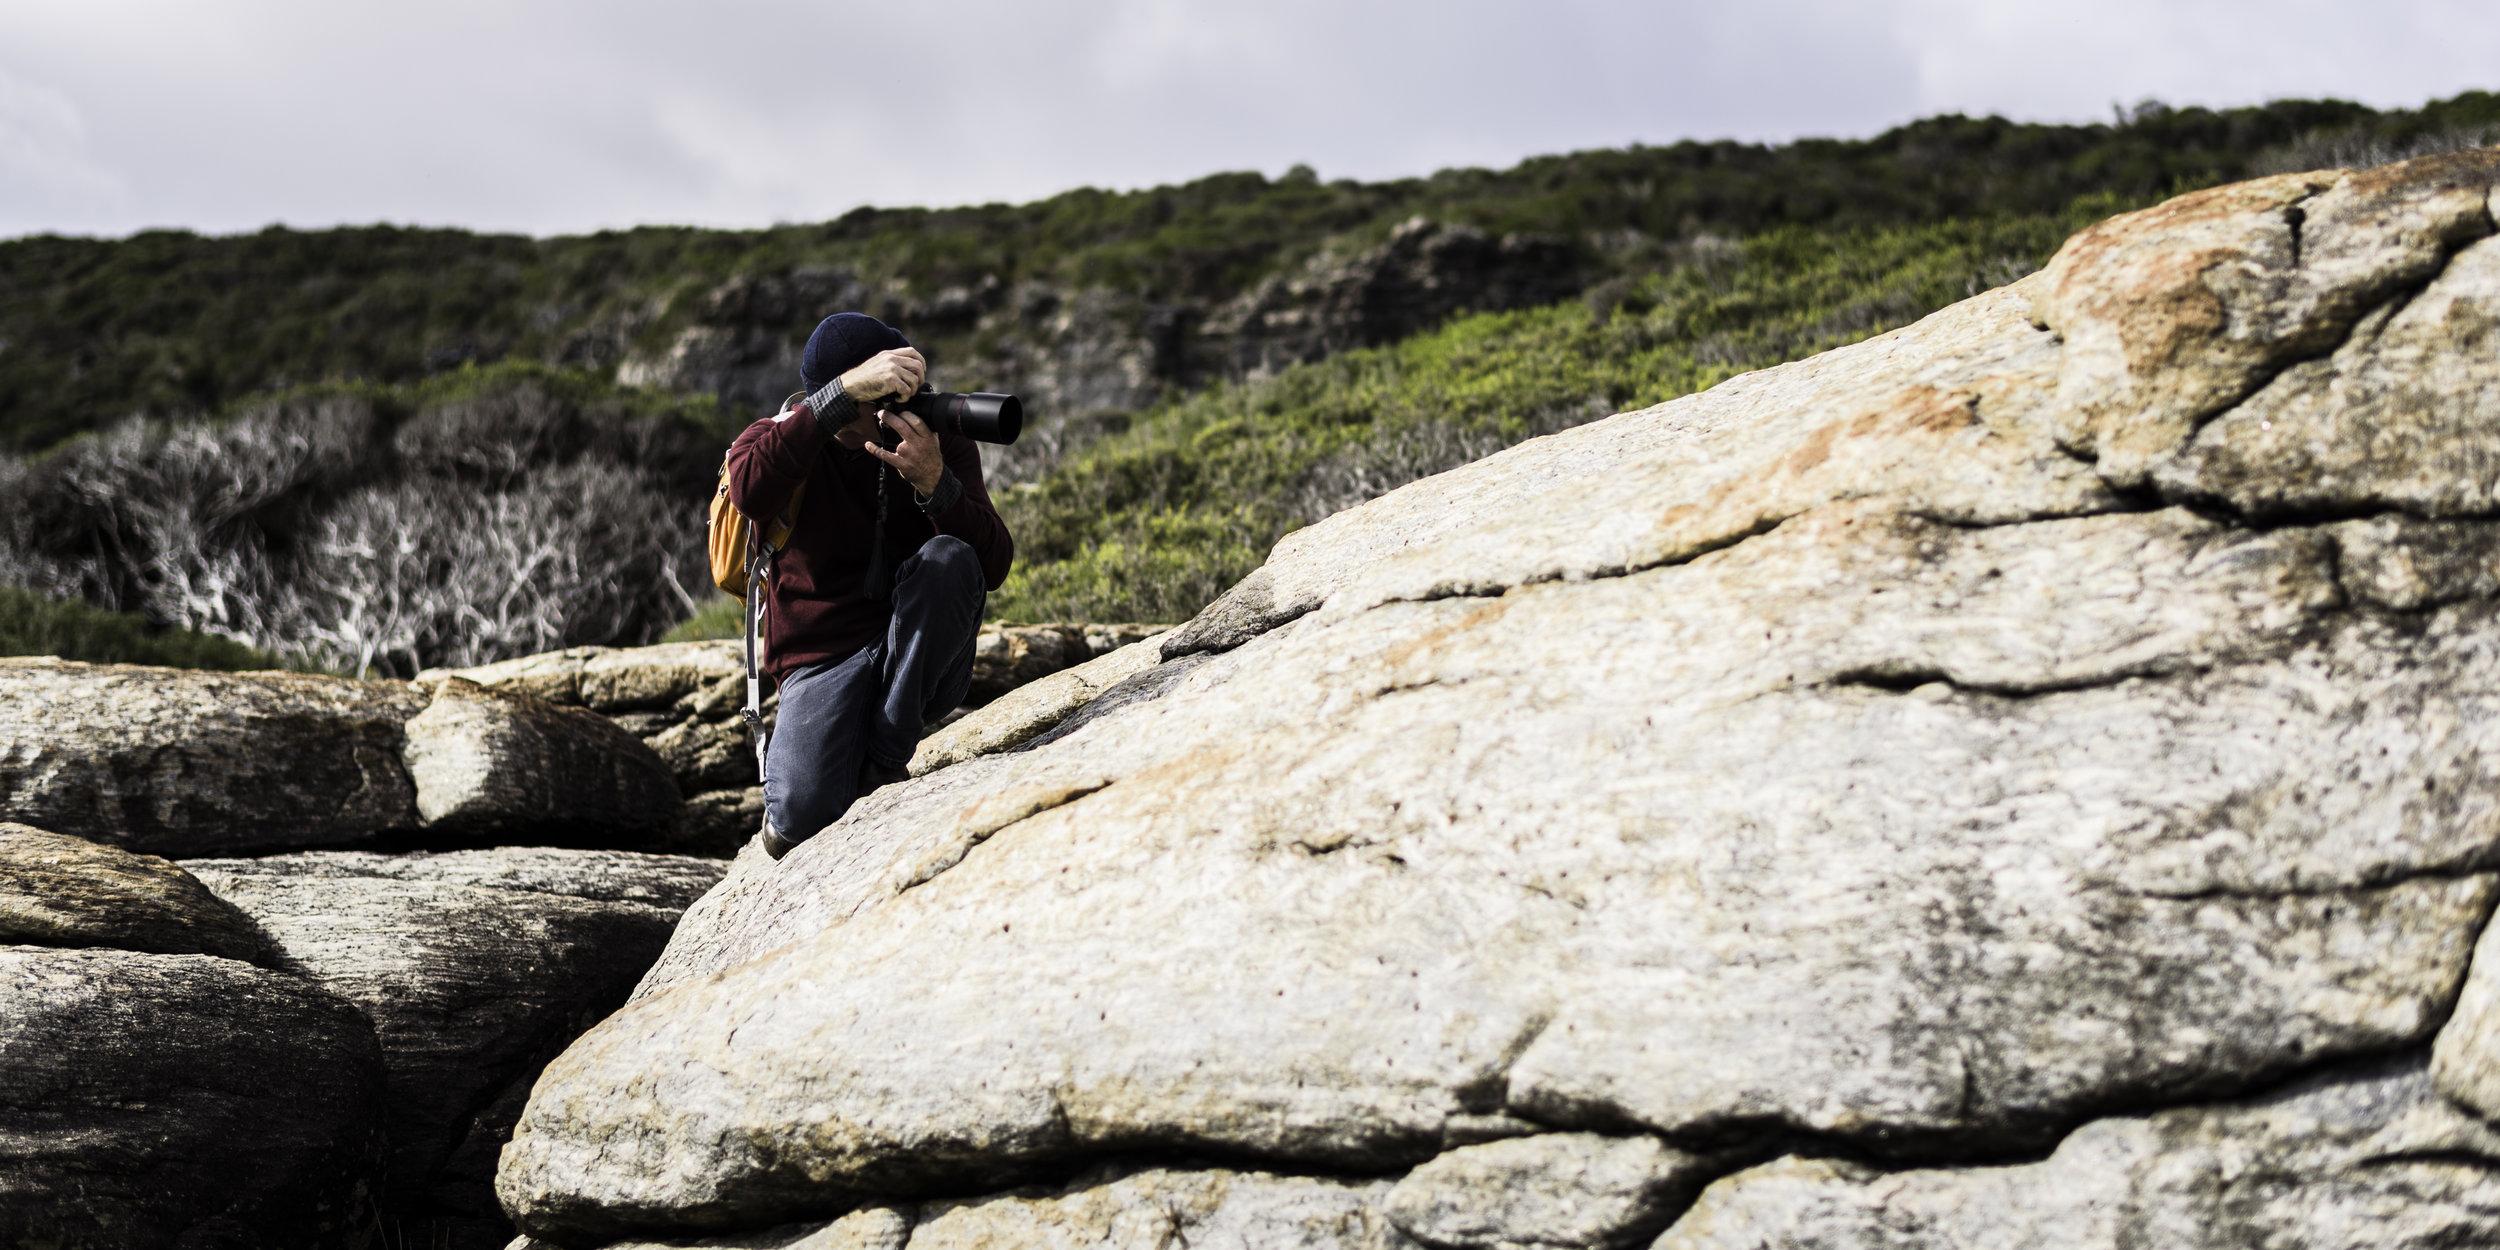 Capture the unique beauty of the Australia's southwest on the Cape to Cape track